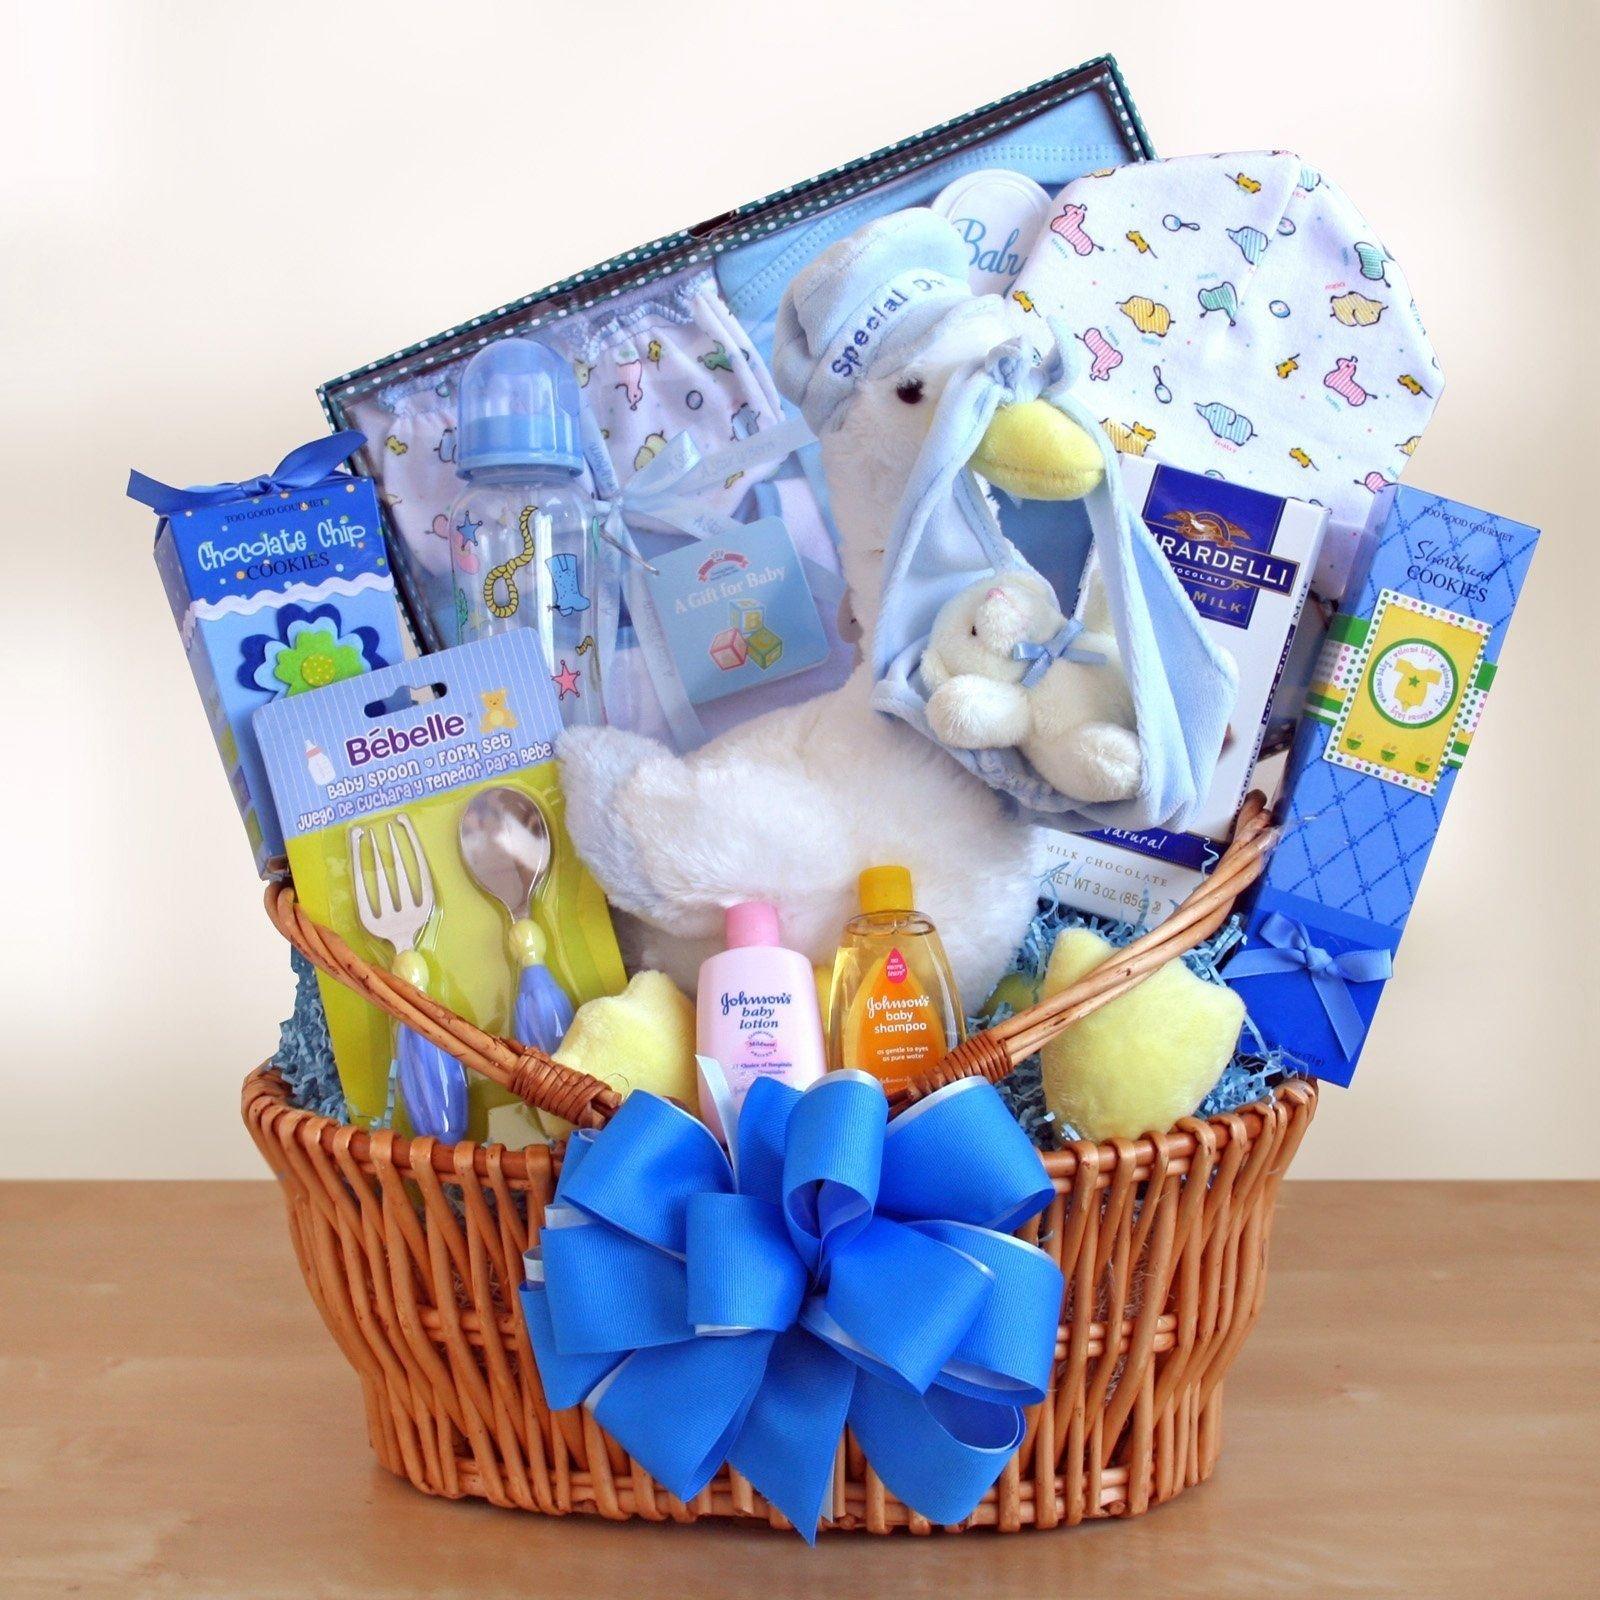 10 Most Popular Baby Boy Gift Basket Ideas special stork delivery baby boy gift basket baby shower gift 2 2020